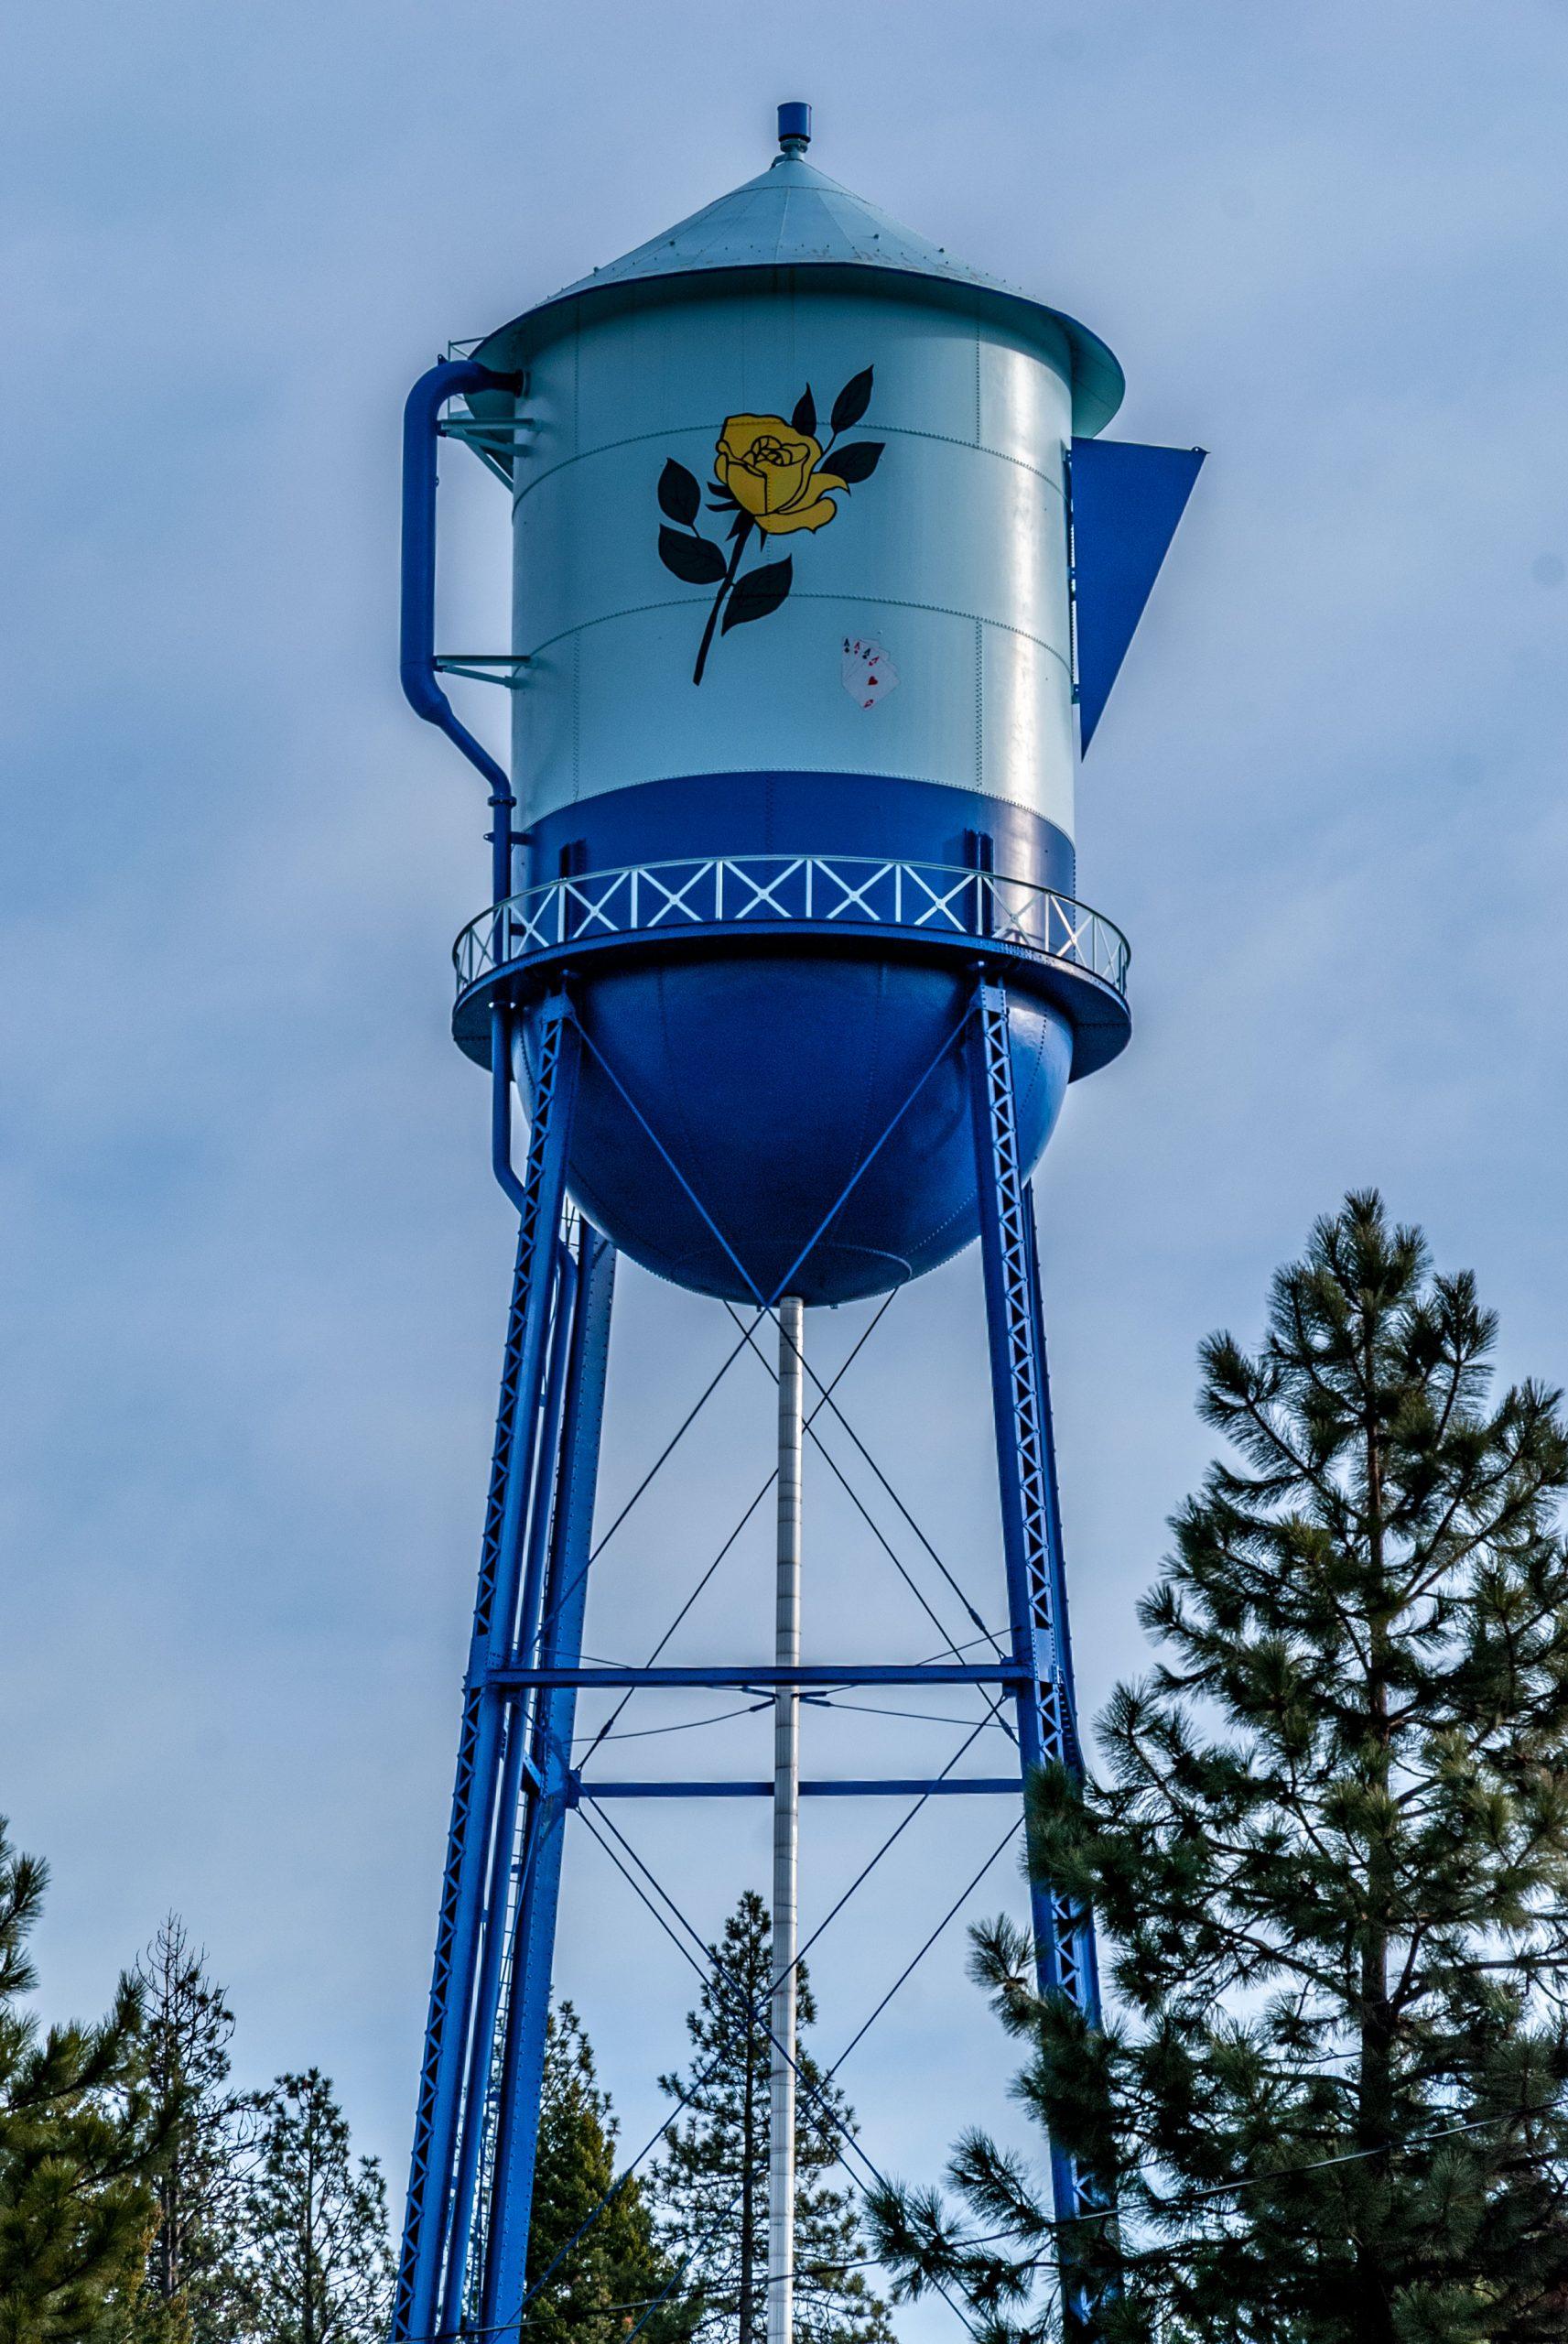 The Spirit Lake, Idaho Water Tower